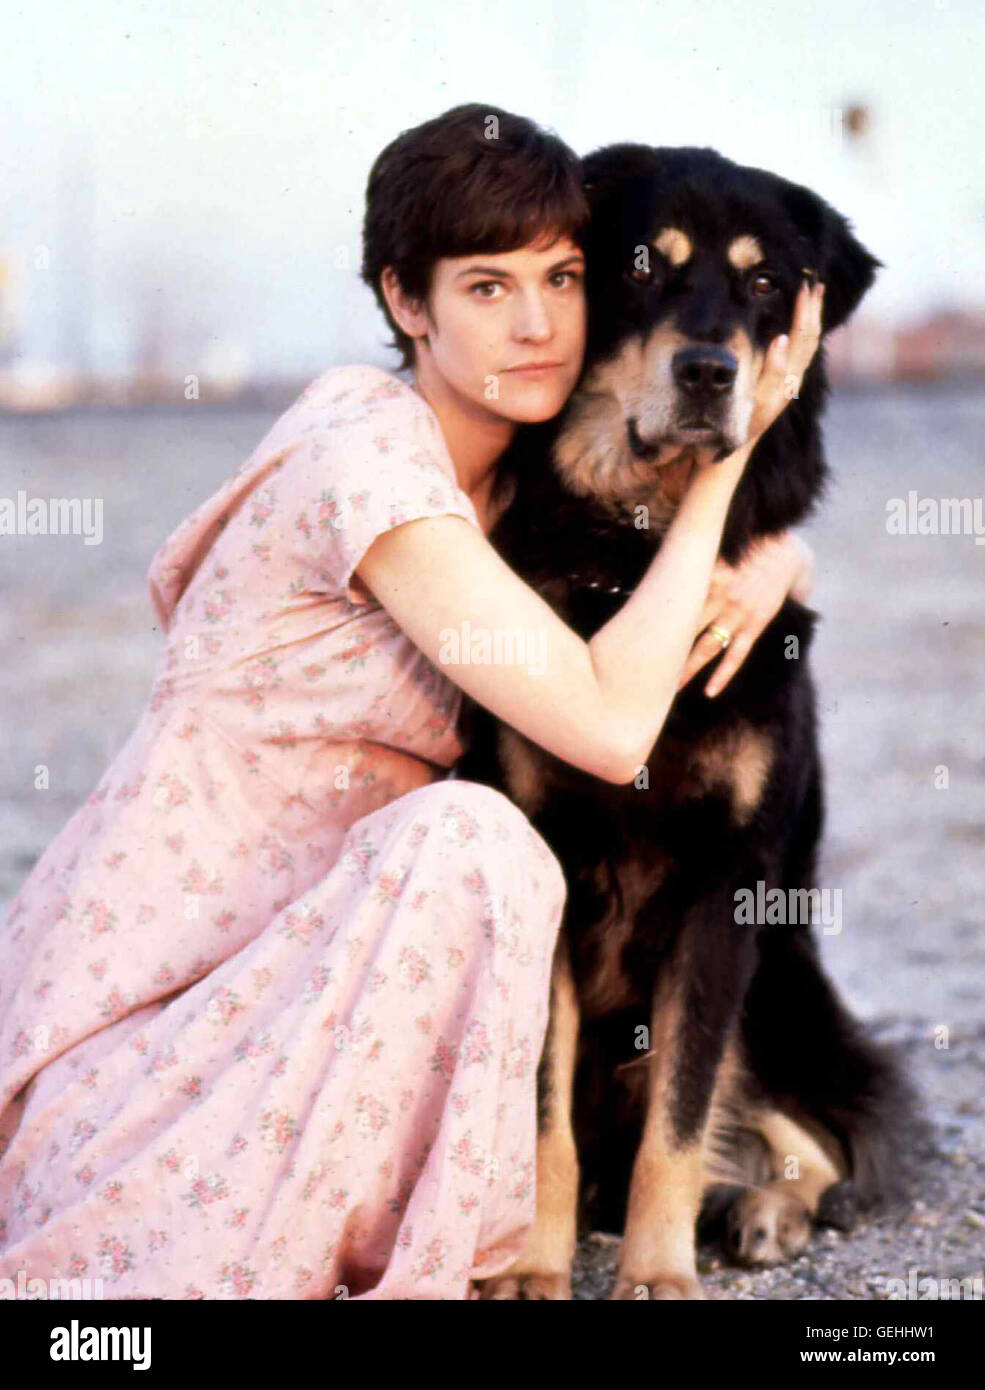 Lori Tanner (Ally Sheedy) mit Max in Szene. *** Local Caption *** 1993, Man's Best Friend, A, Der Tod Kommt - Stock Image